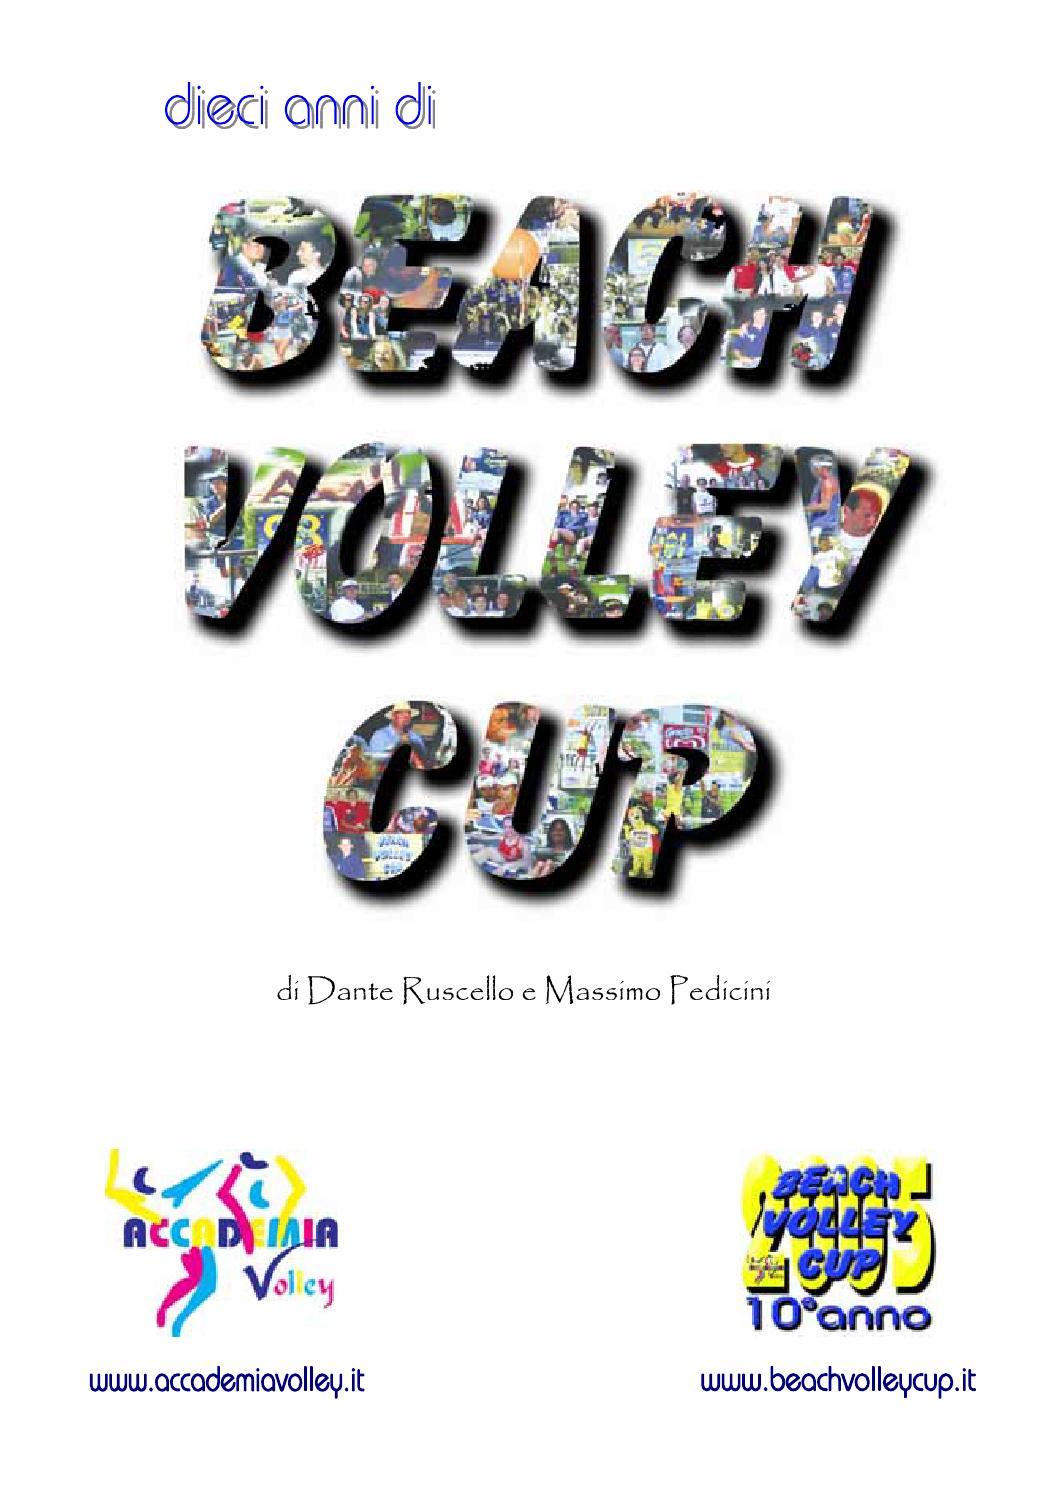 84171b74fe Dieci anni di Beach Volley Cup by Accademia Volley - issuu